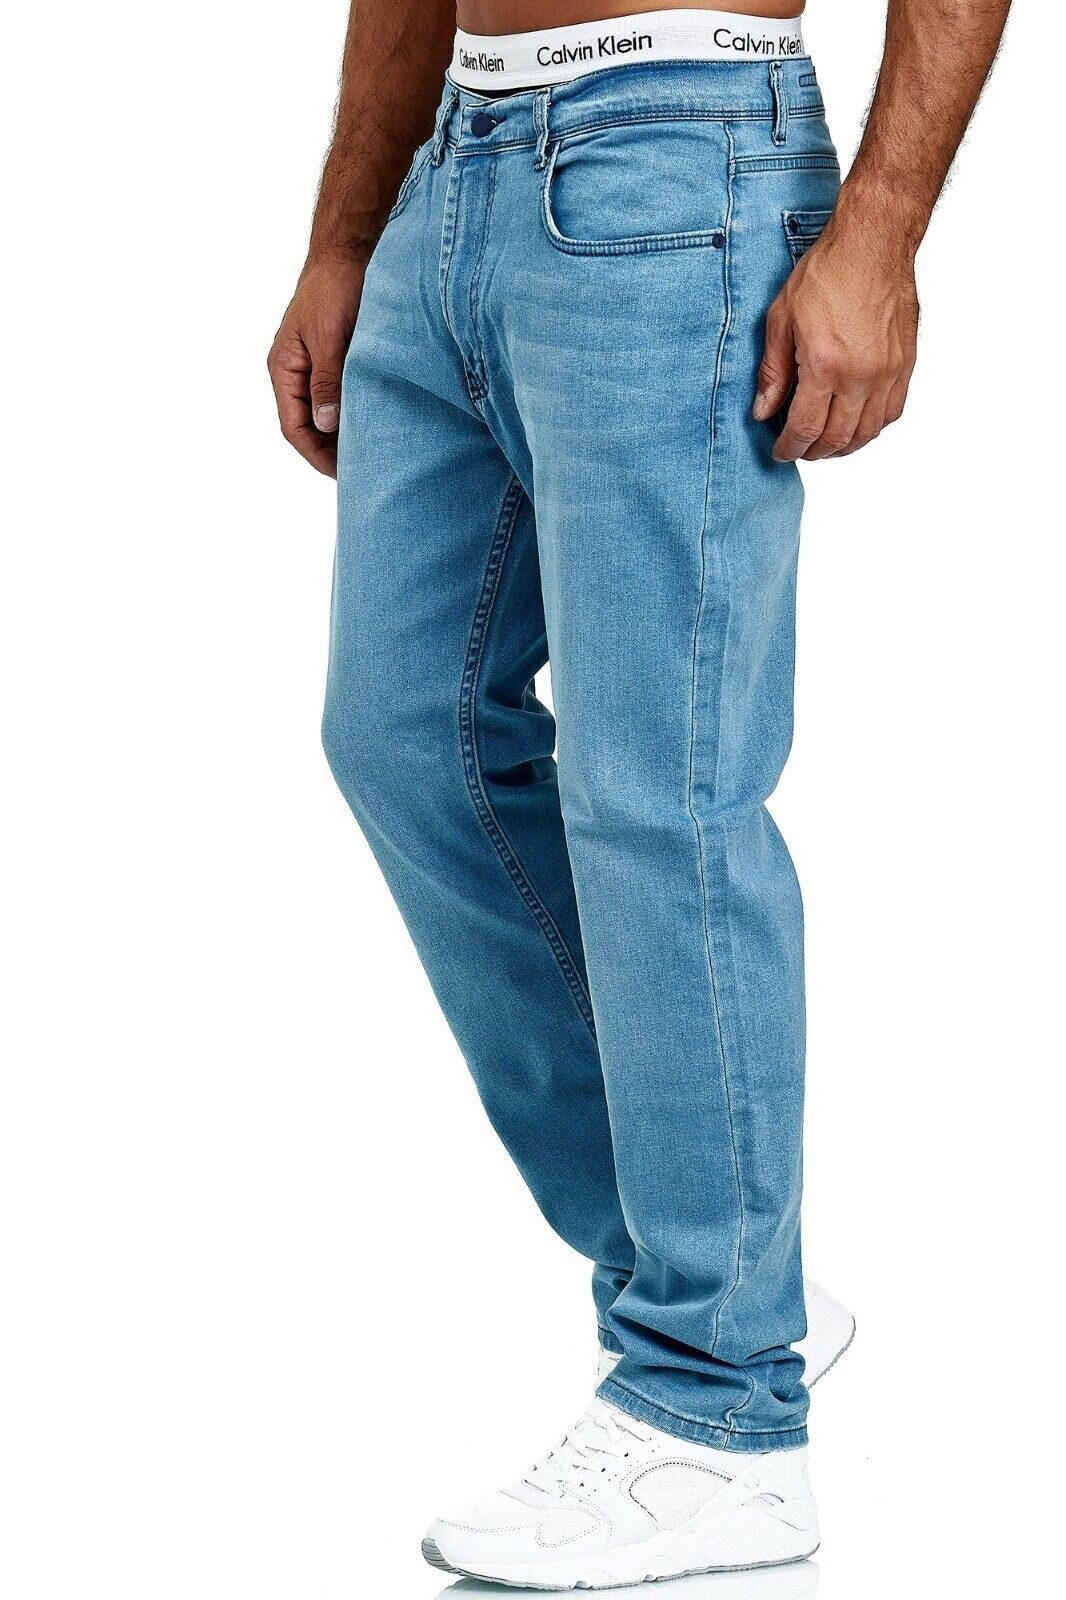 Herren-Jeans-Hose-Denim-KC-Black-Washed-Straight-Cut-Regular-Dicke-Naht-naehte Indexbild 72